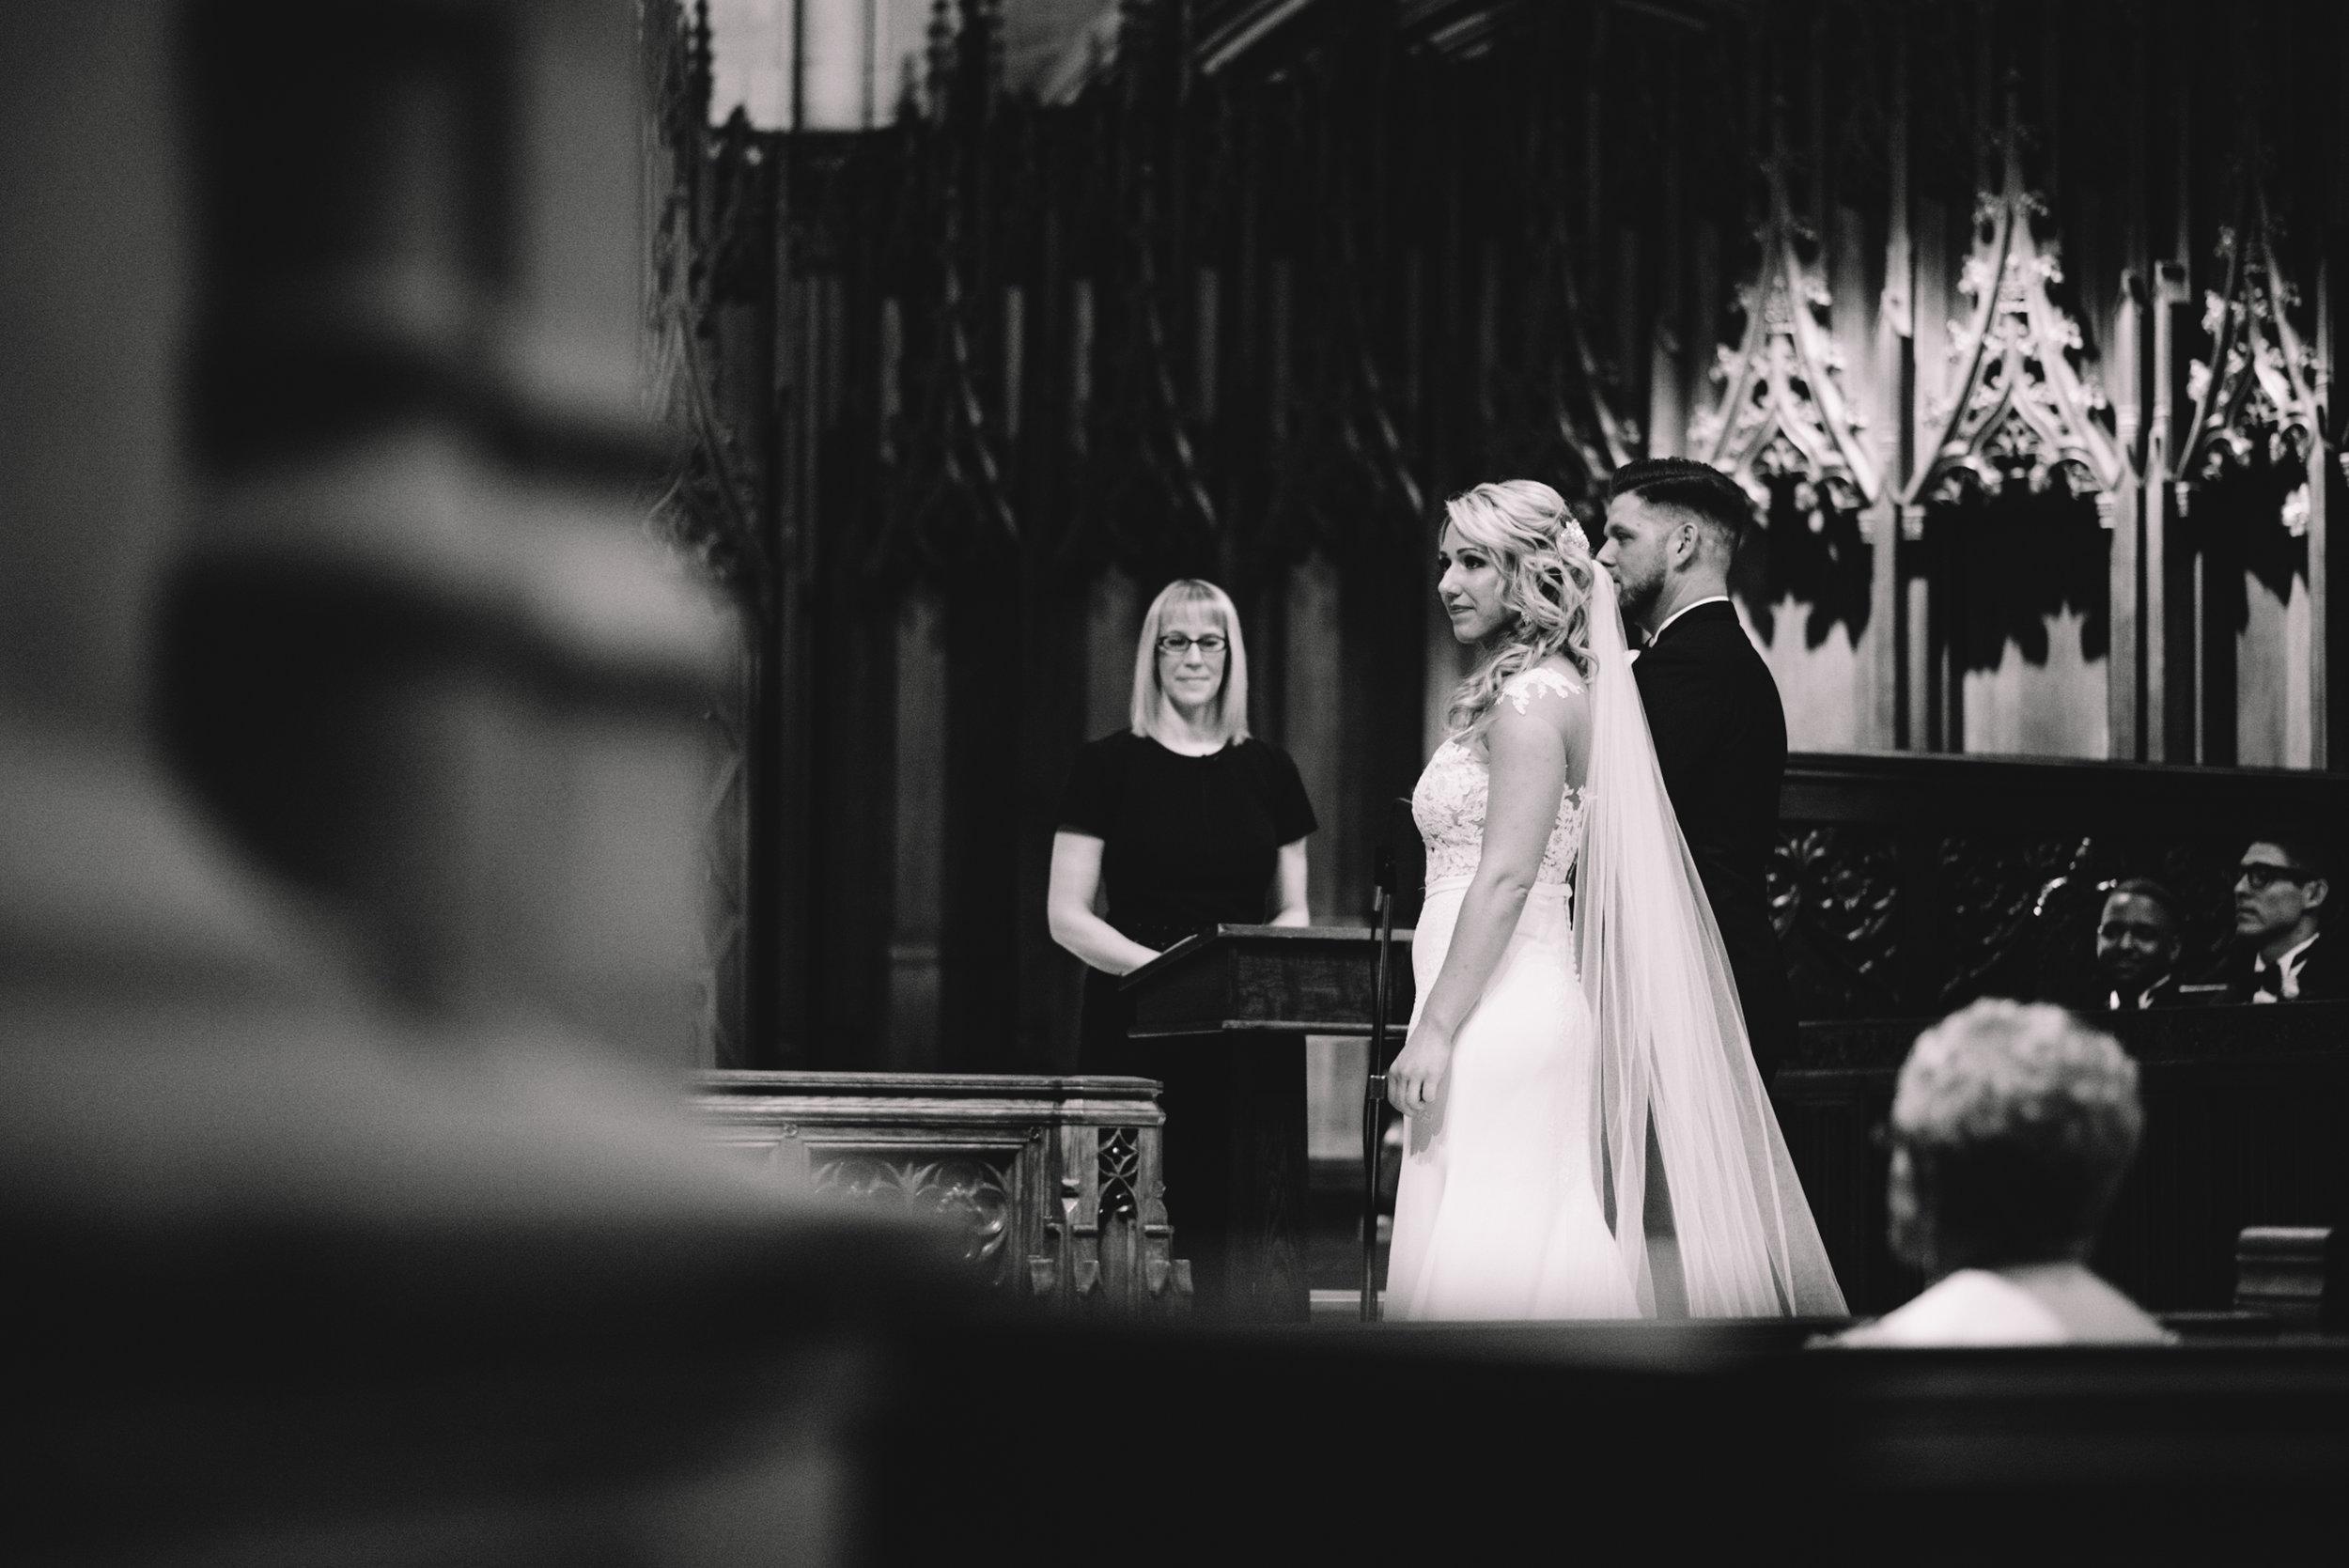 Pittsburgh Pennsylvania New York NYC Wedding Photographer Photojournalist Luxury Downtown Opera - Stirpe 679.jpg